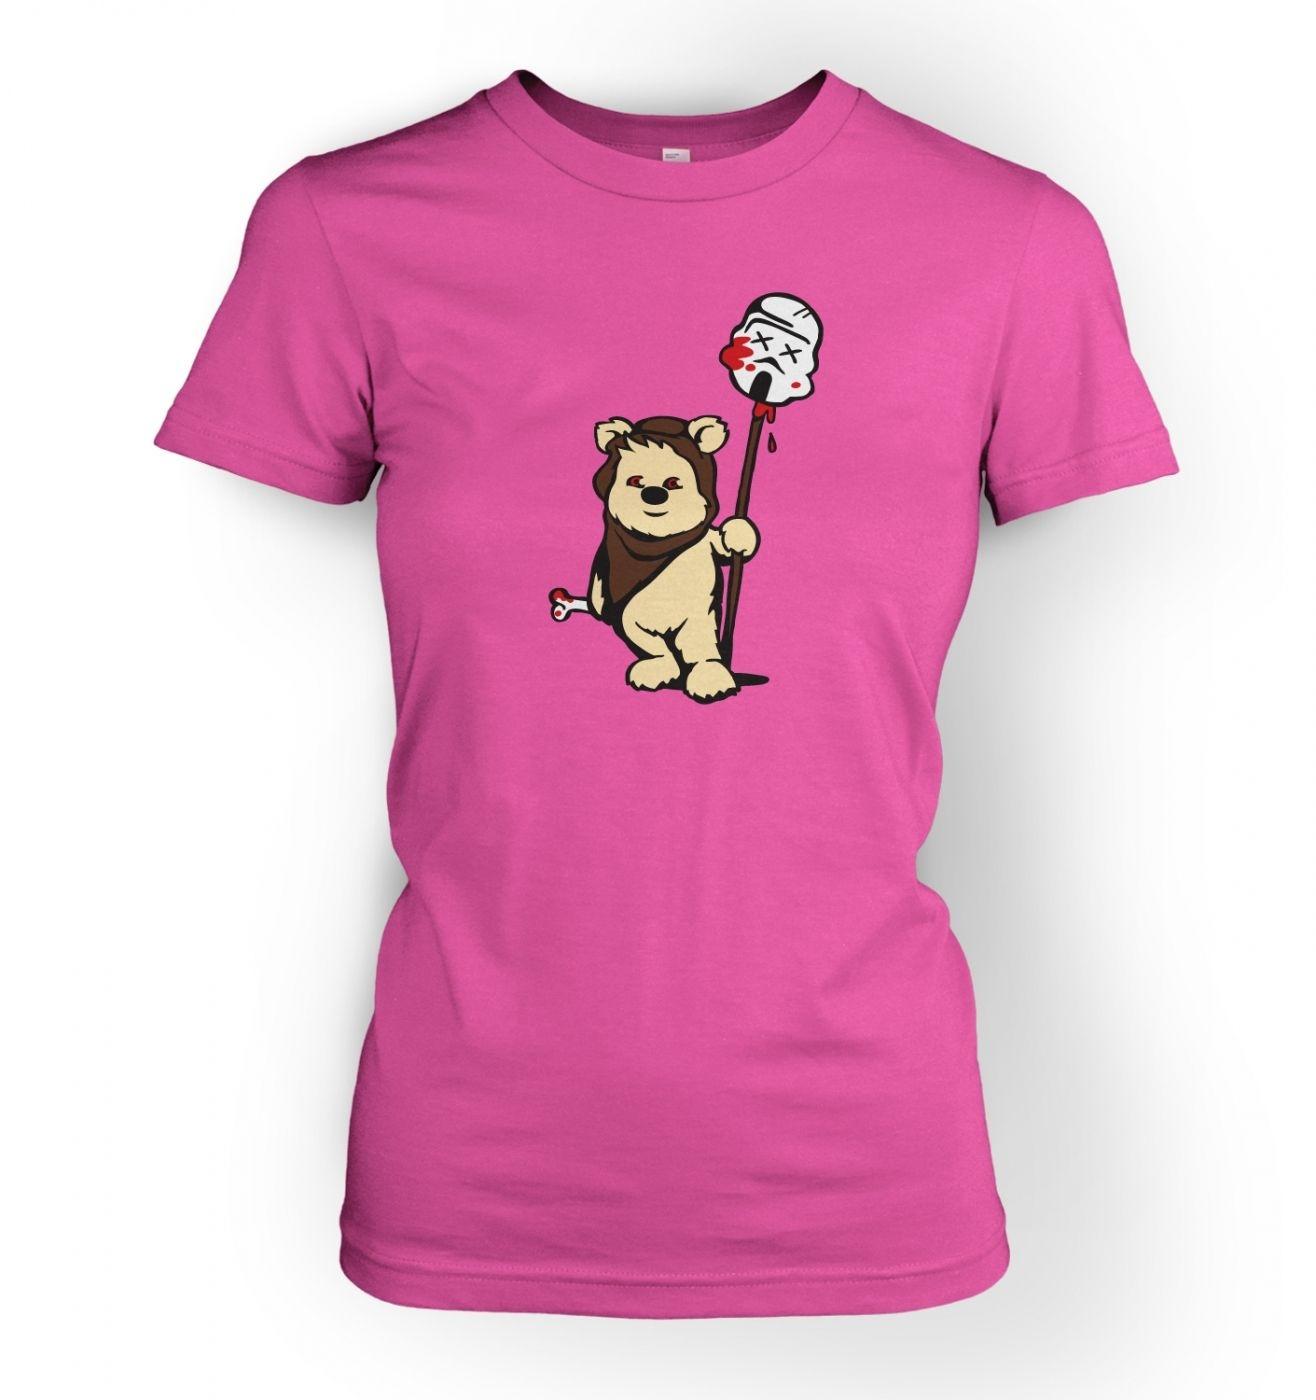 Women's Evil Ewok T-Shirt - Inspired by Star Wars